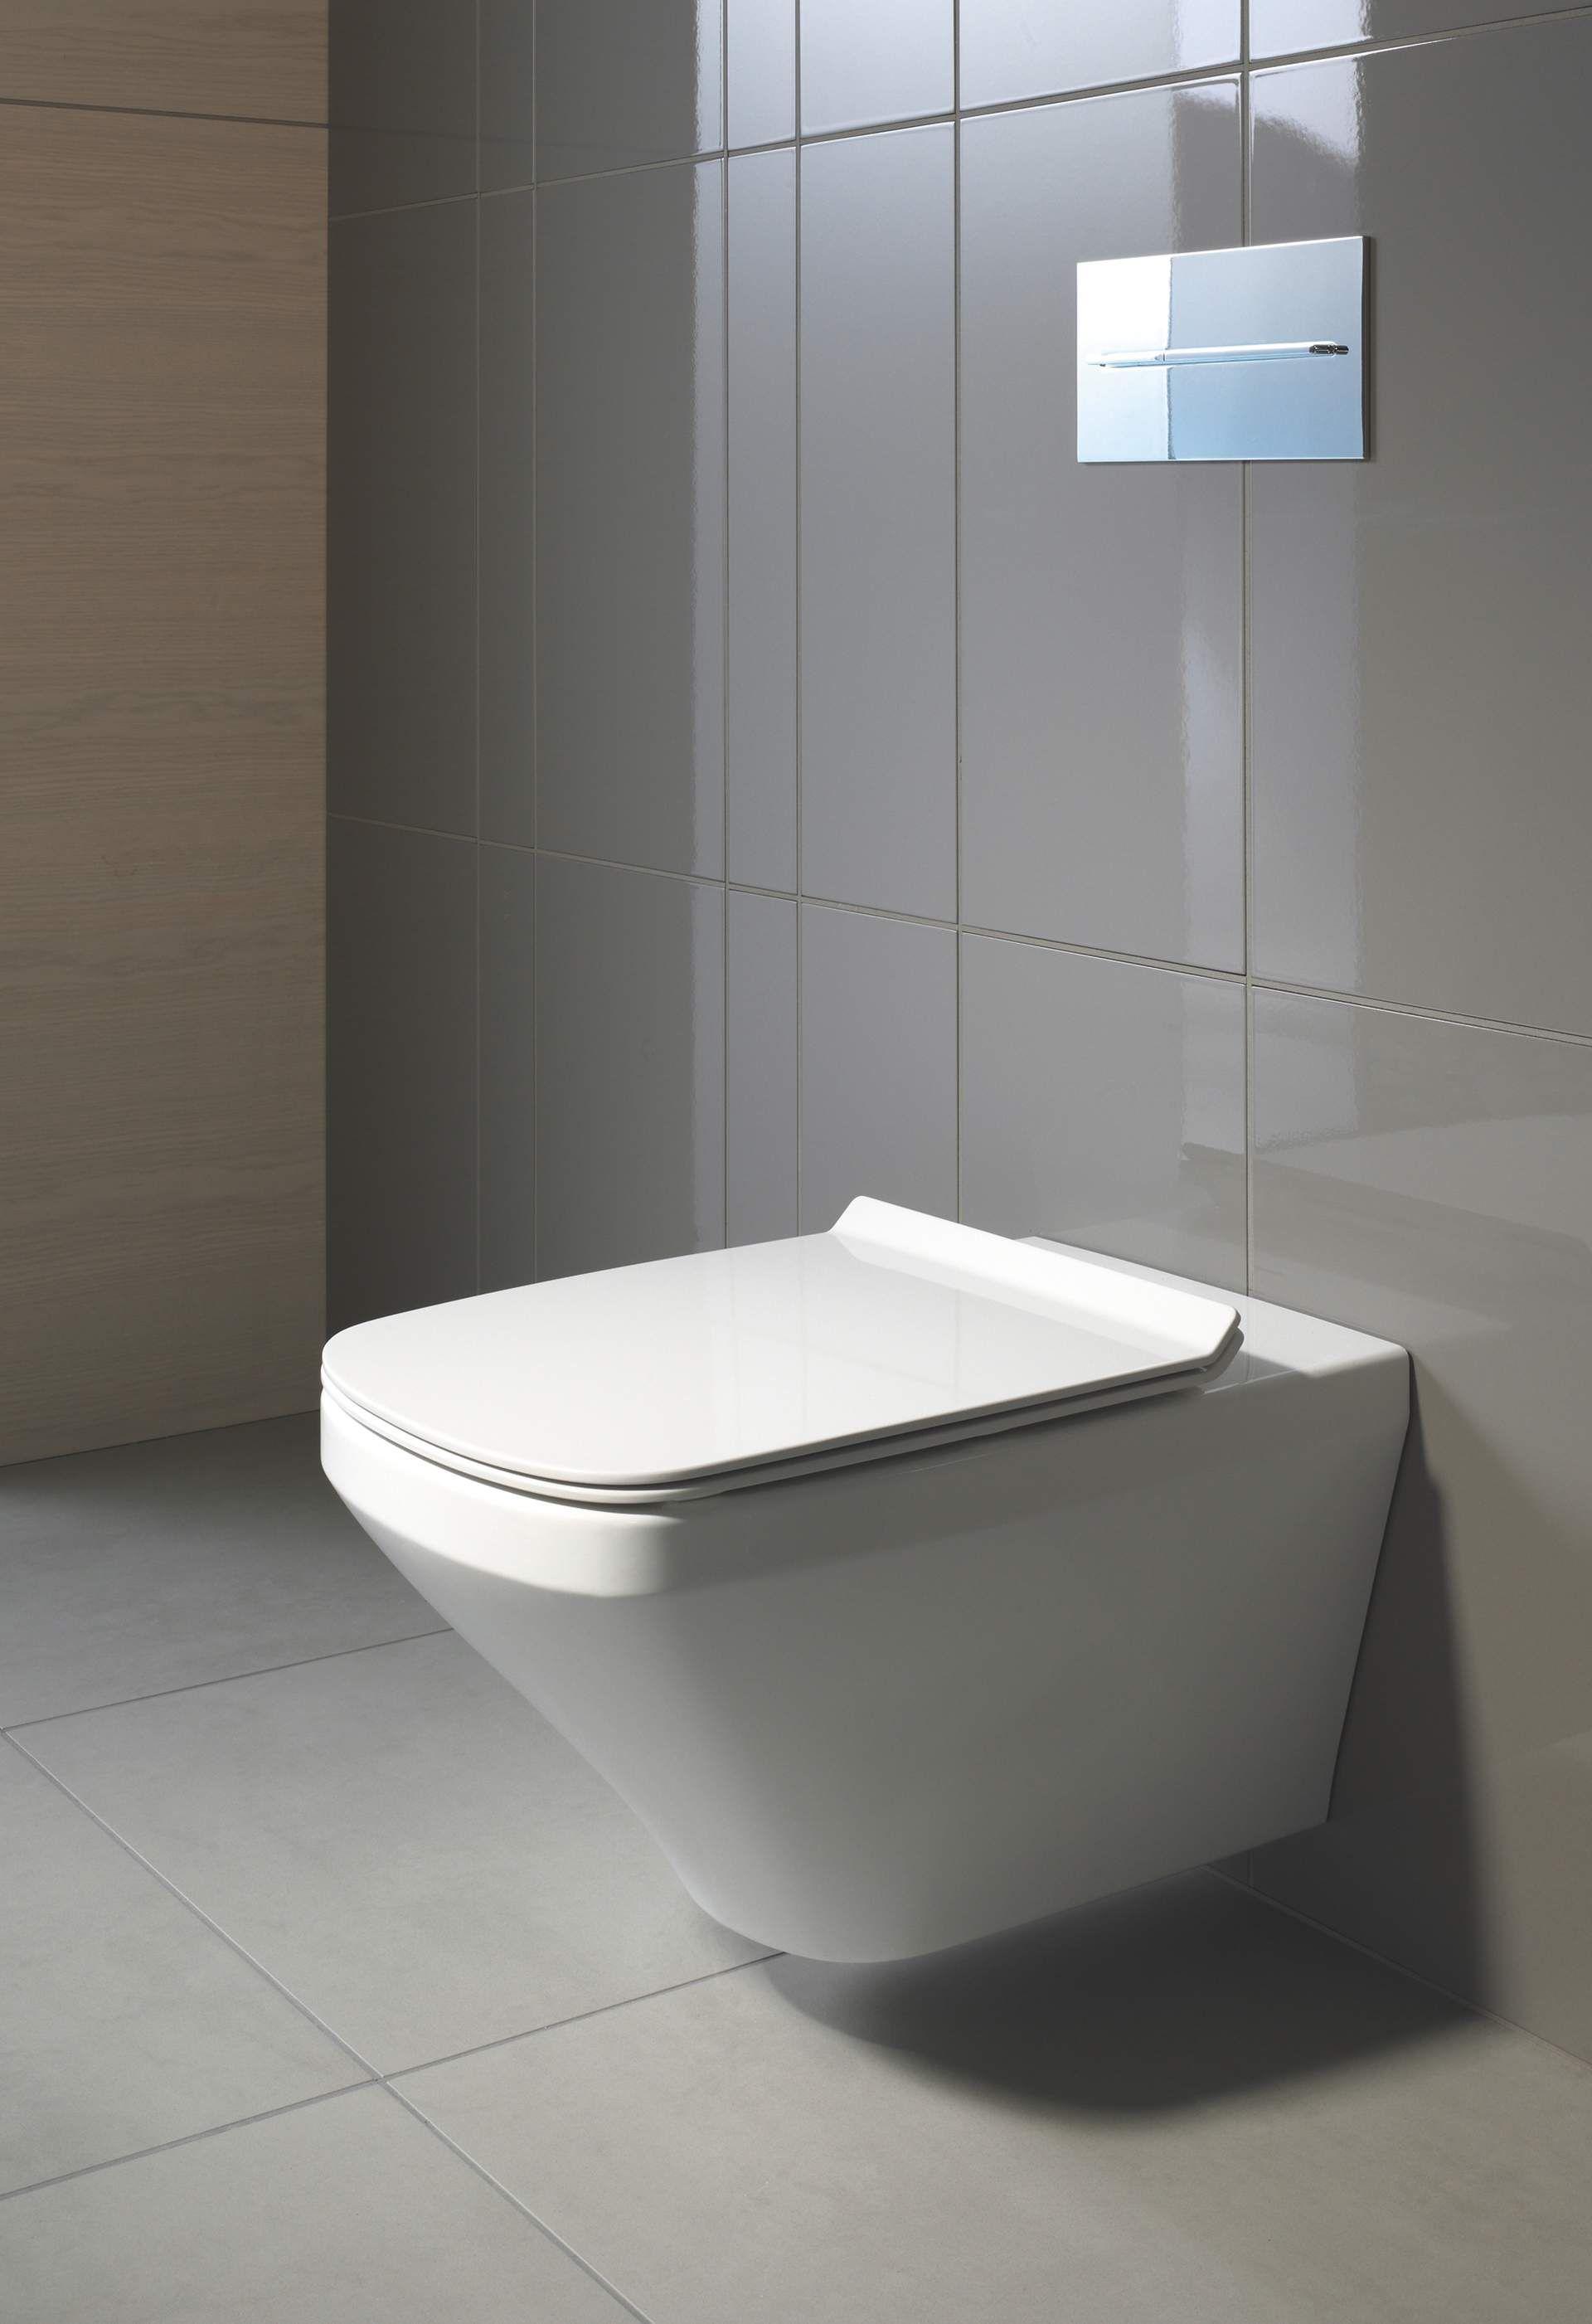 Durastyle Toilet Wall Mounted Duravit Rimless 254209 Duravit